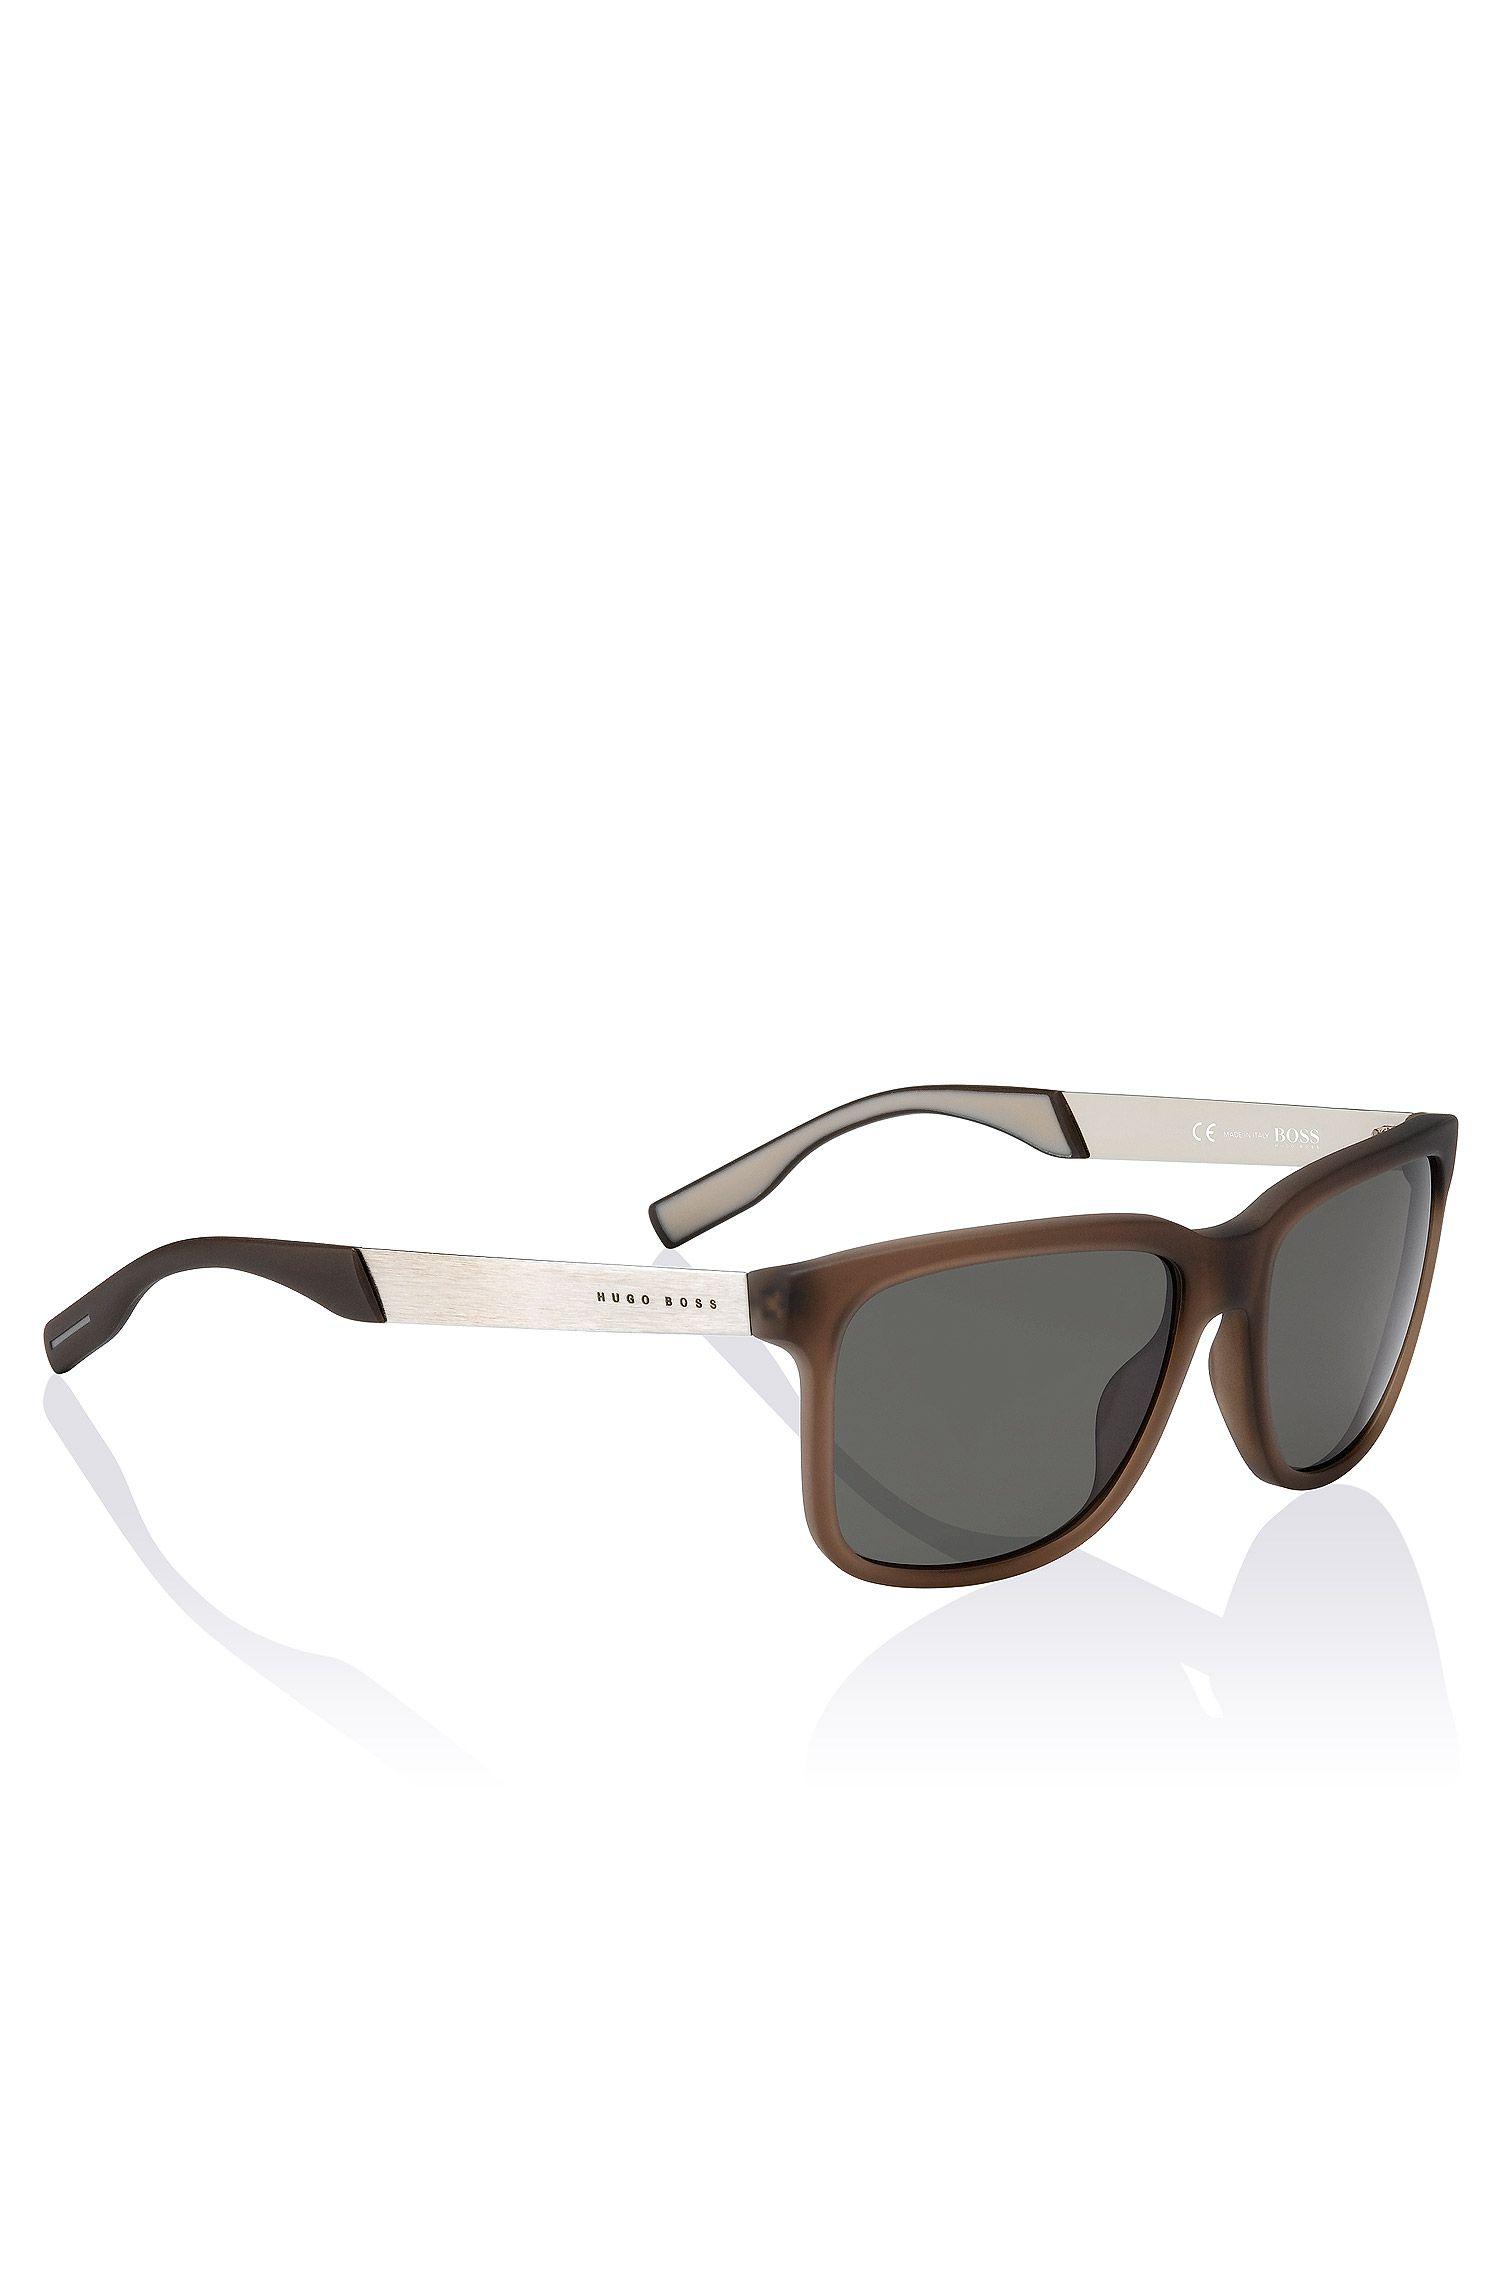 Sonnenbrille ´BOSS 0553/S`, flexible Bügel